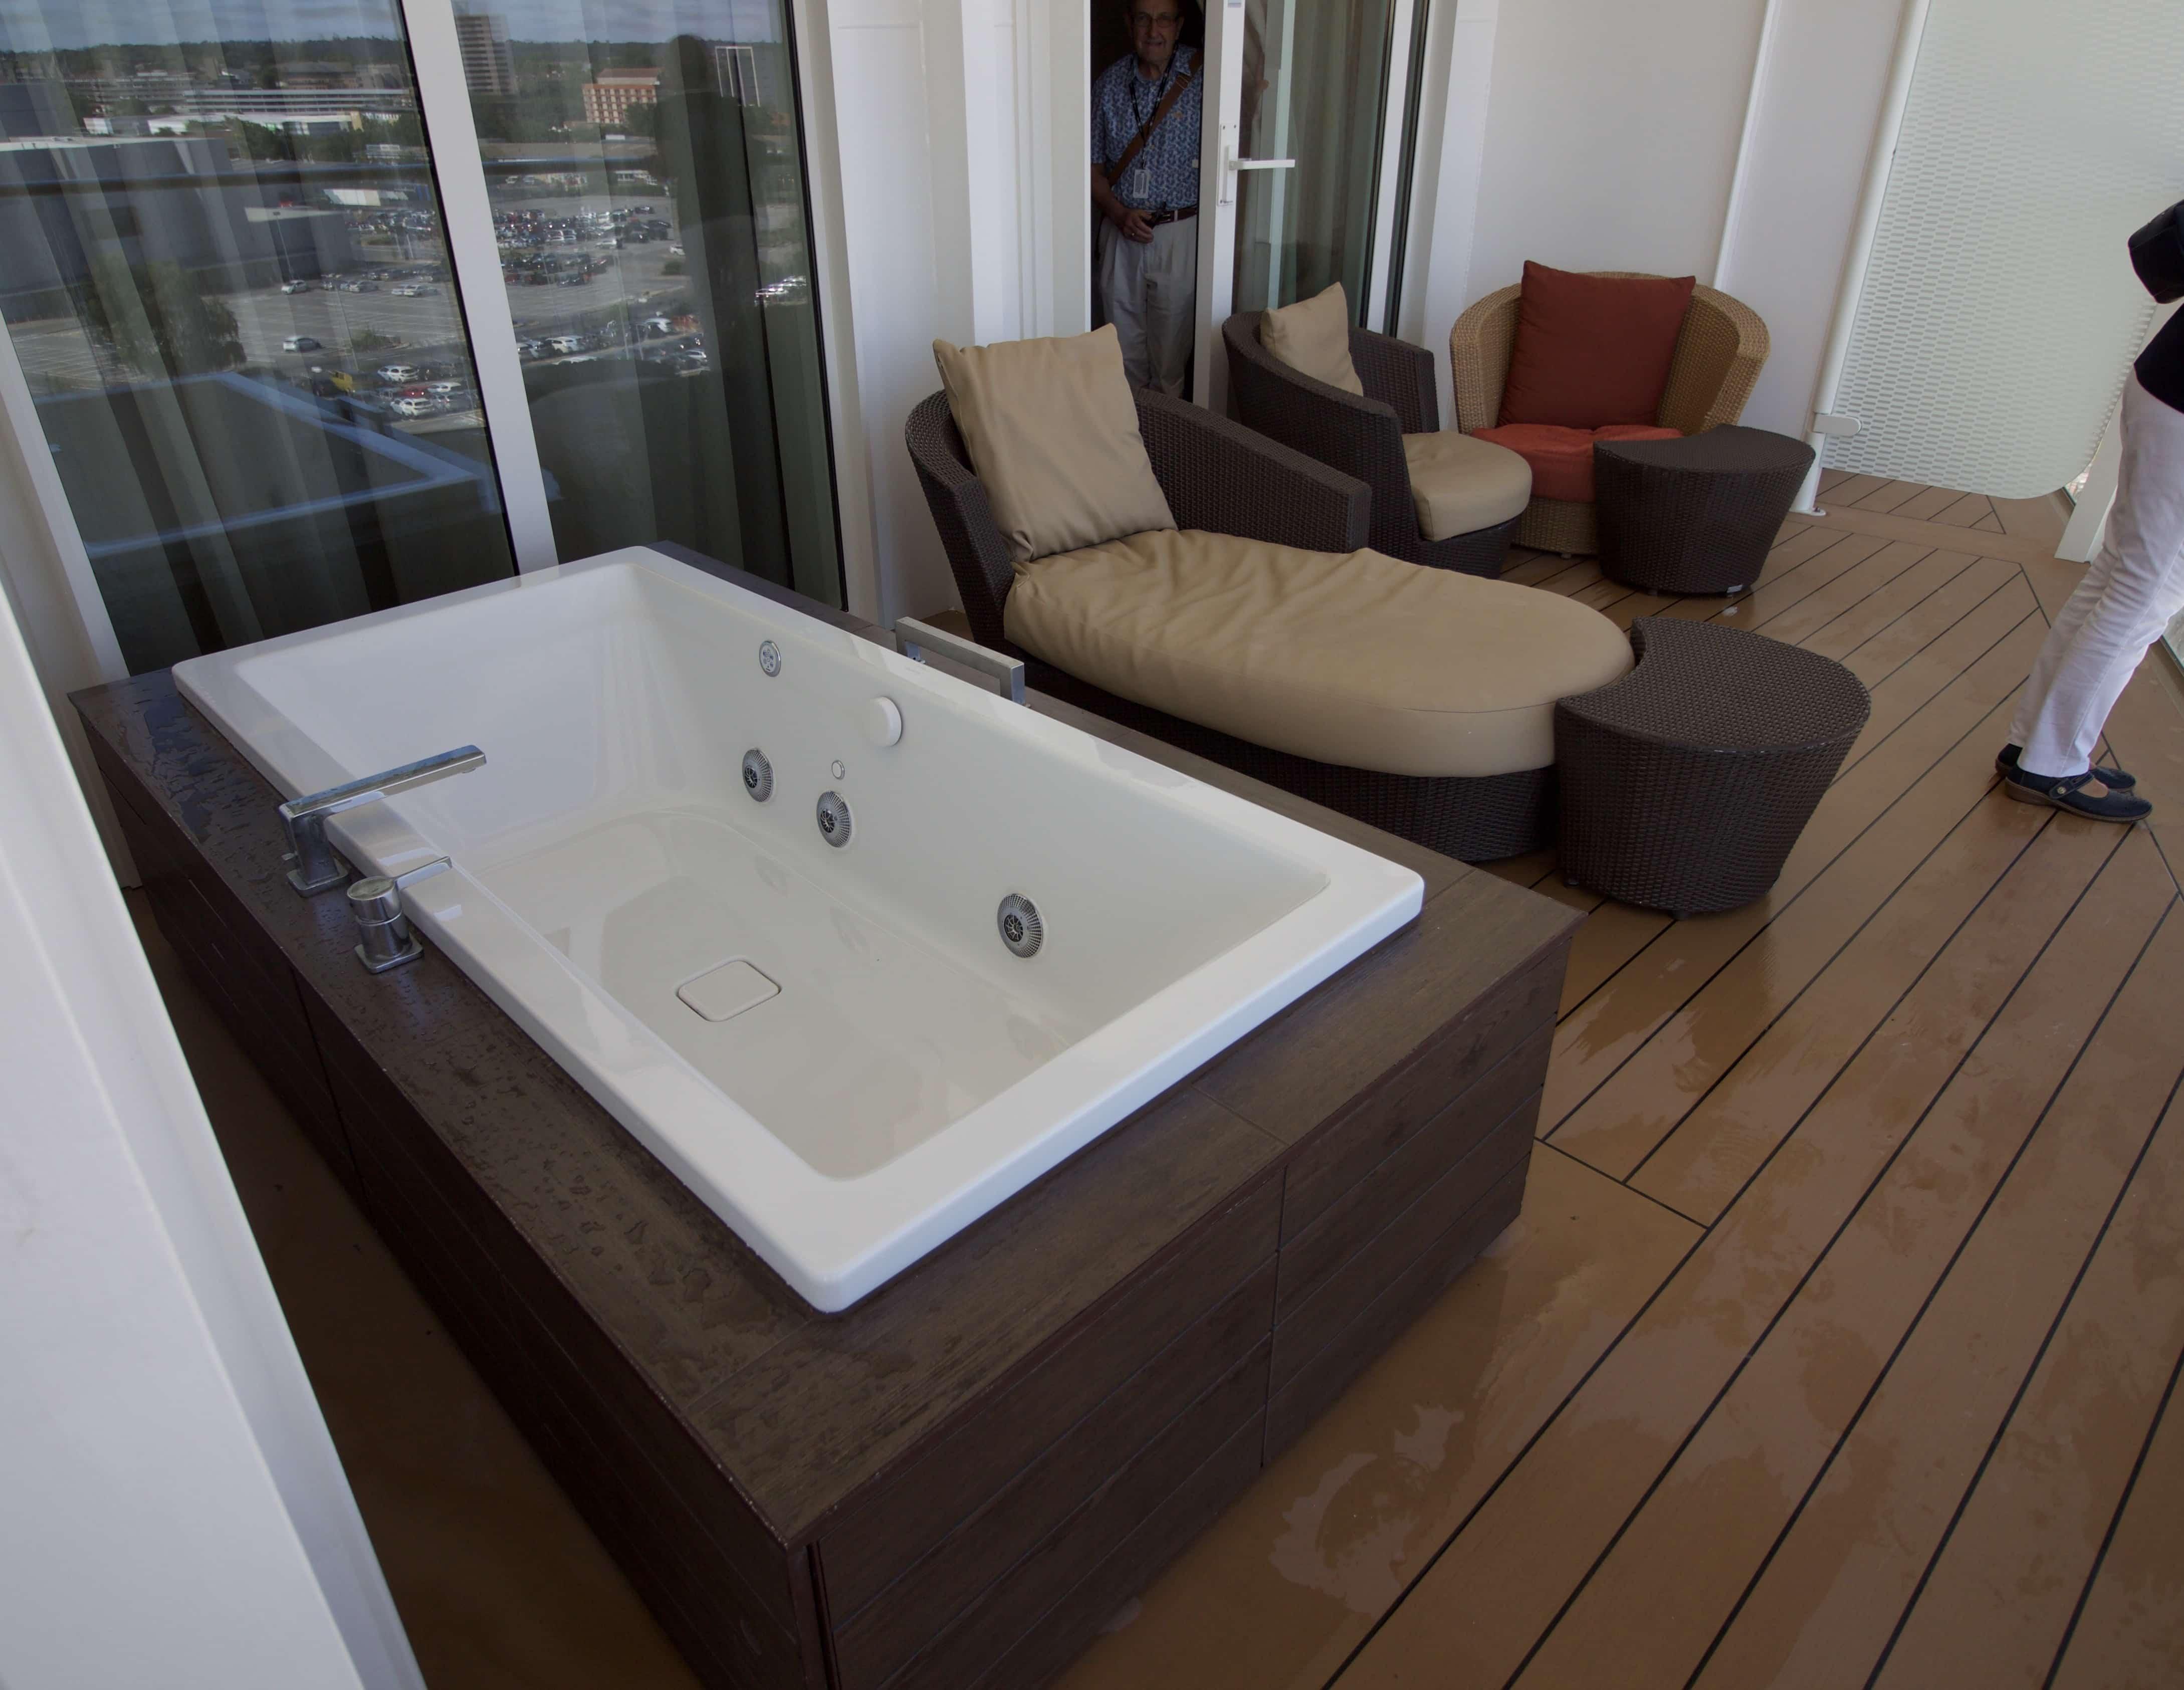 Celebrity Eclipse - Penthouse suite whirlpool jacuzzi balcony